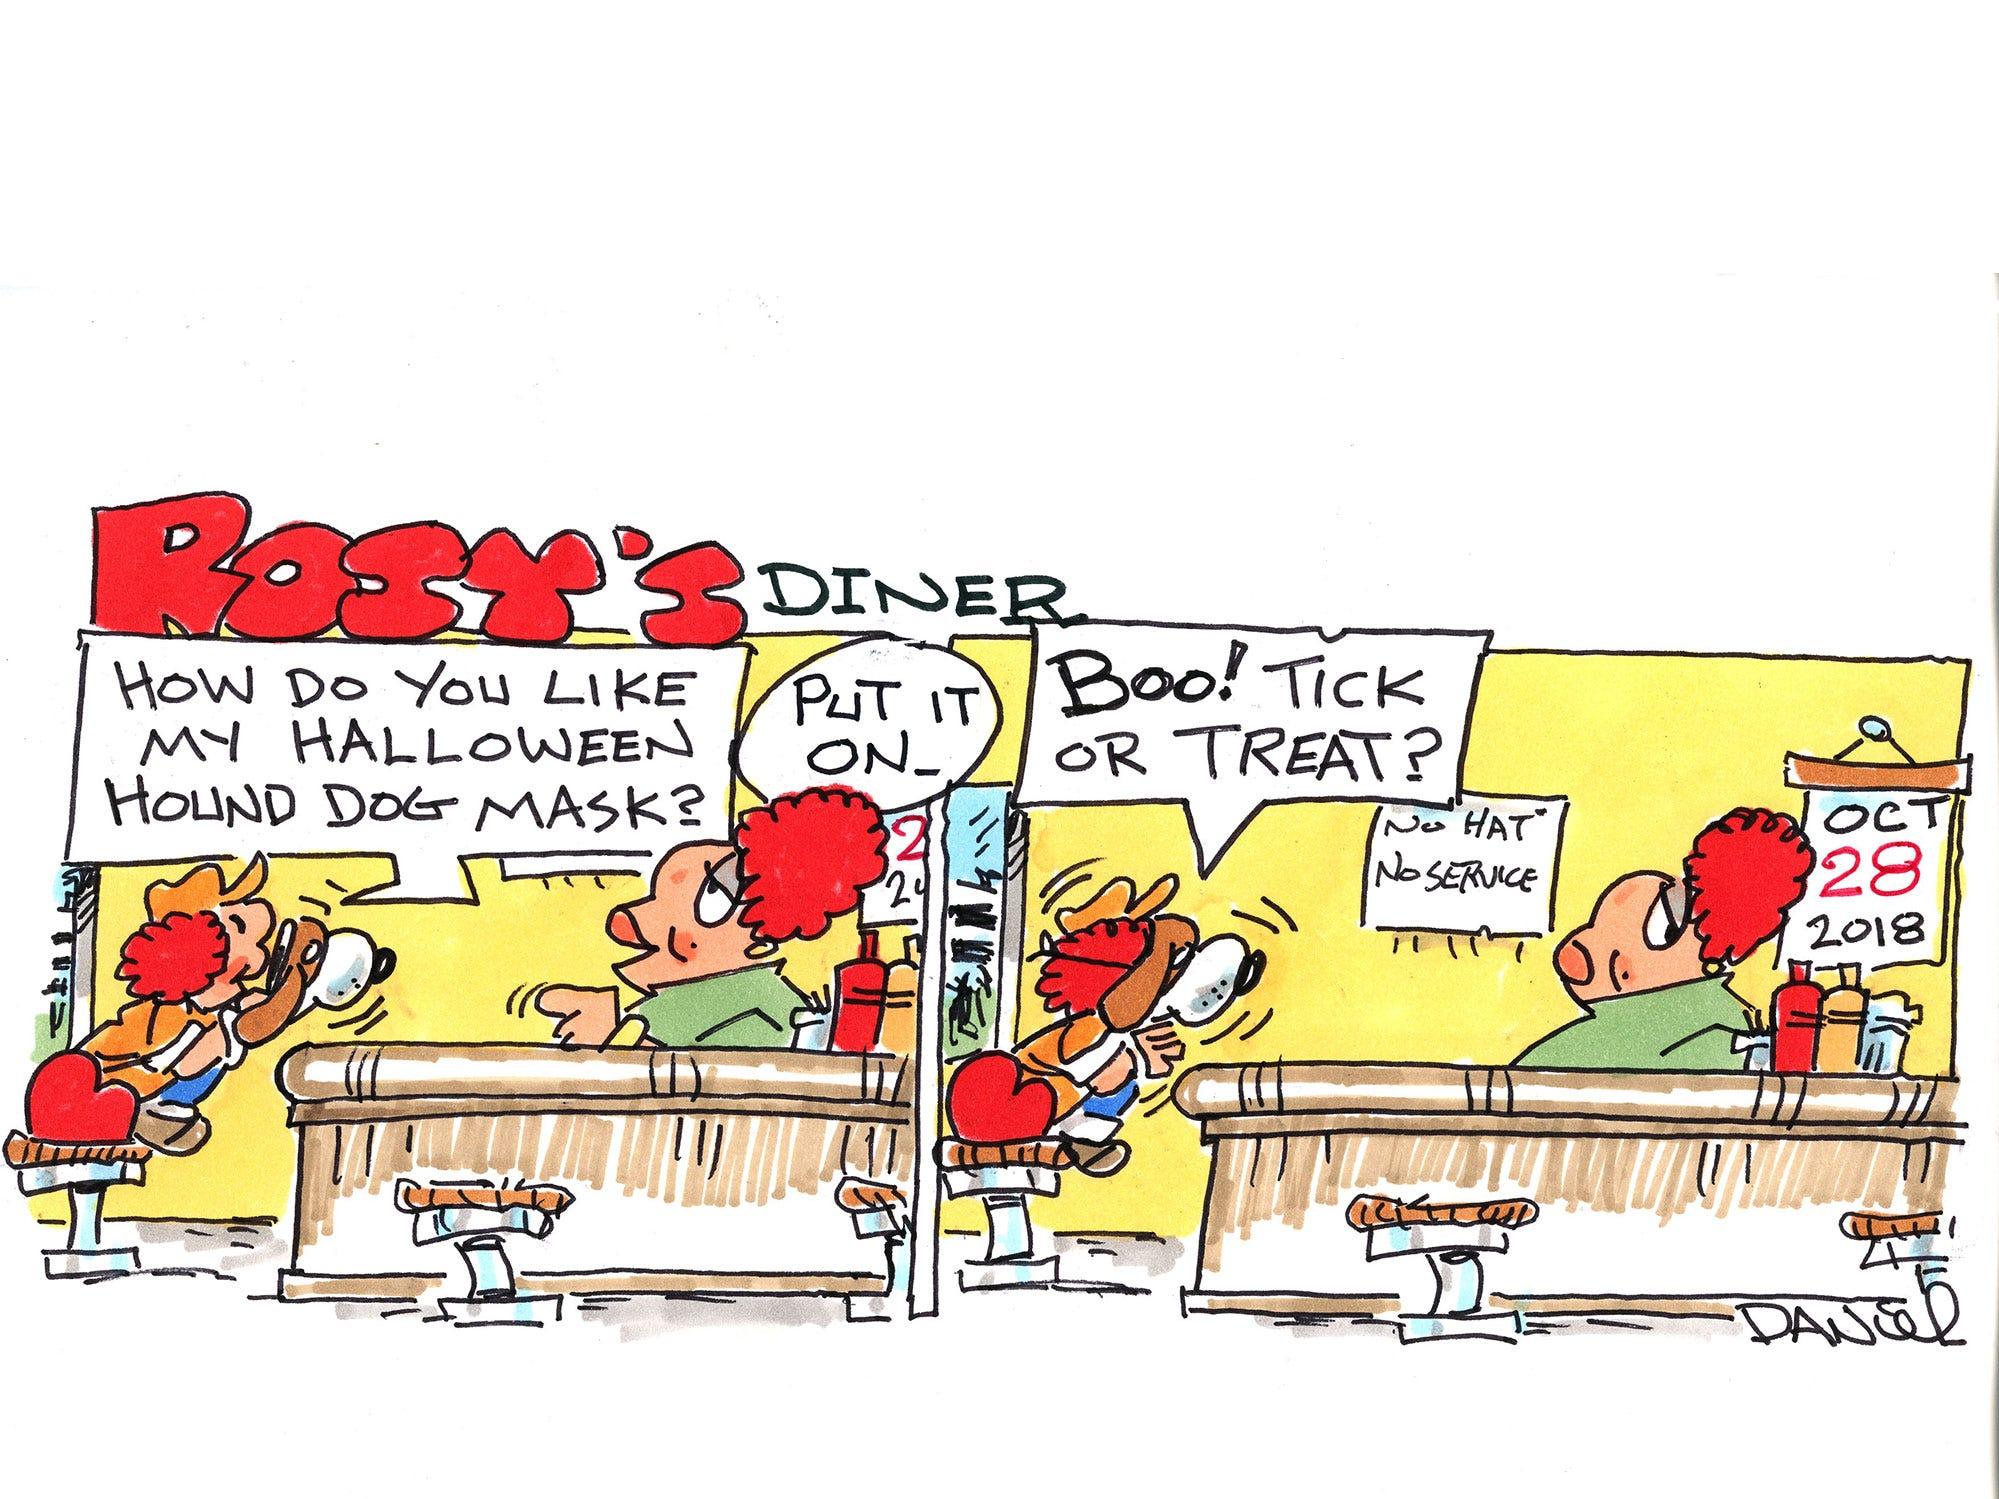 Charlie Daniel editorial cartoon for Sunday, Oct. 28, 2018.